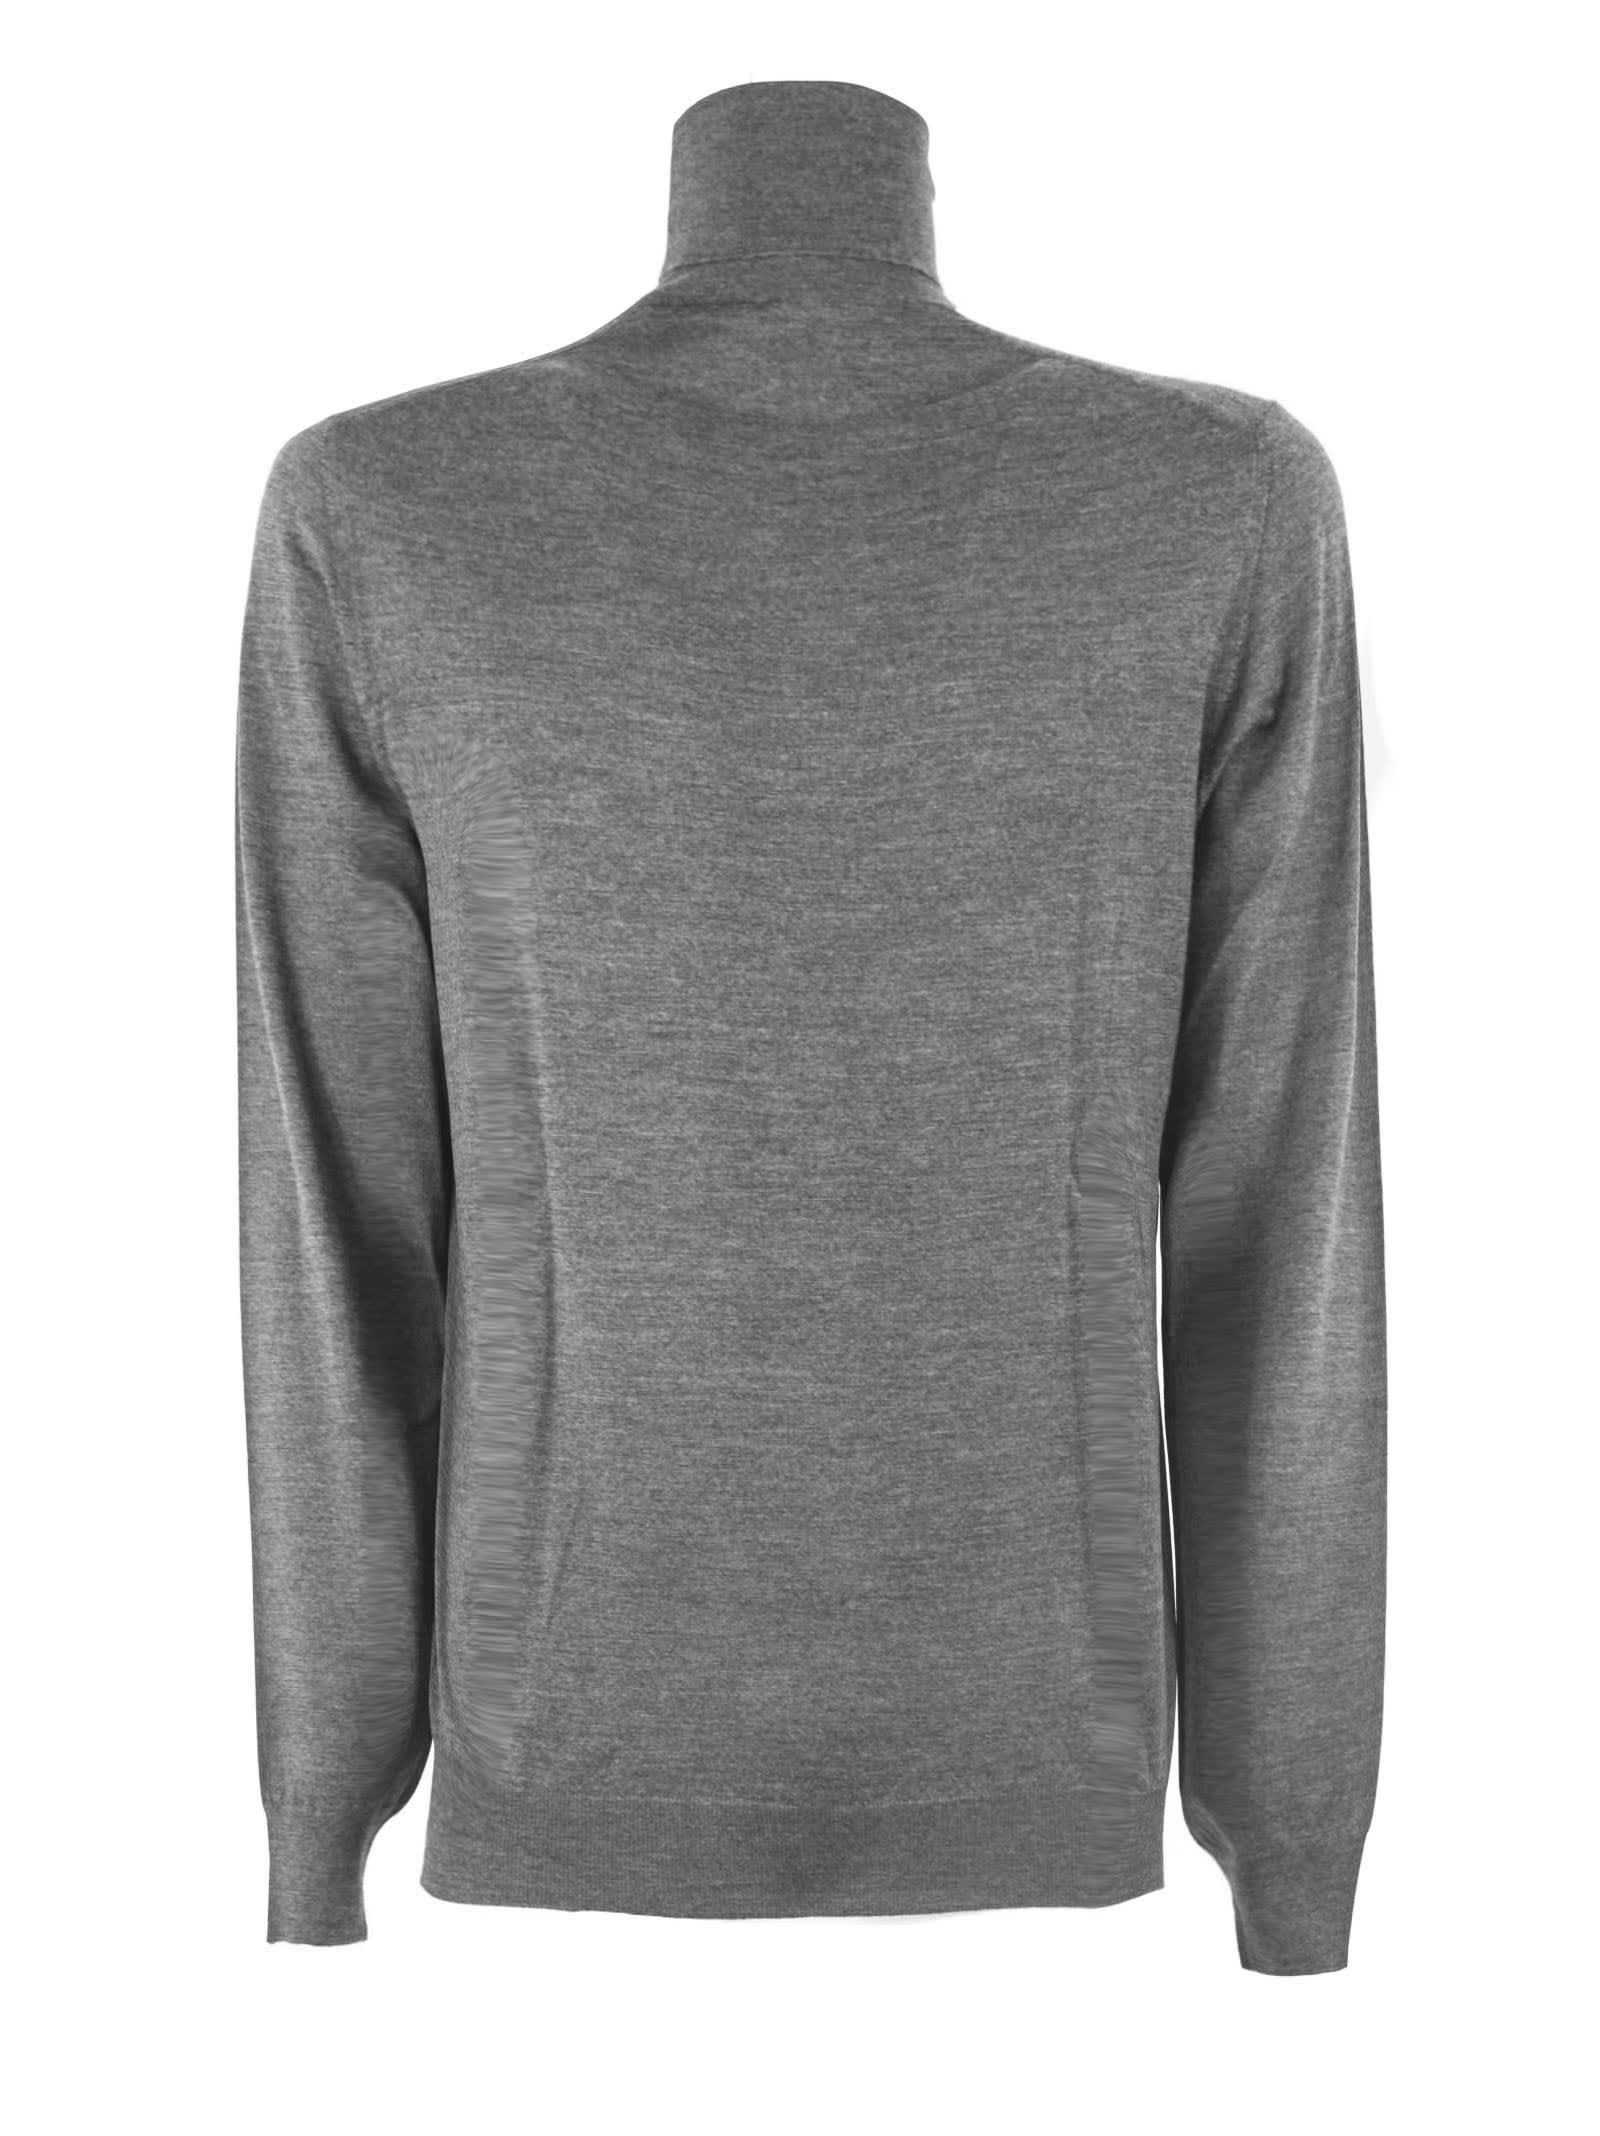 Fedeli Grey Virgin Wool Sweater